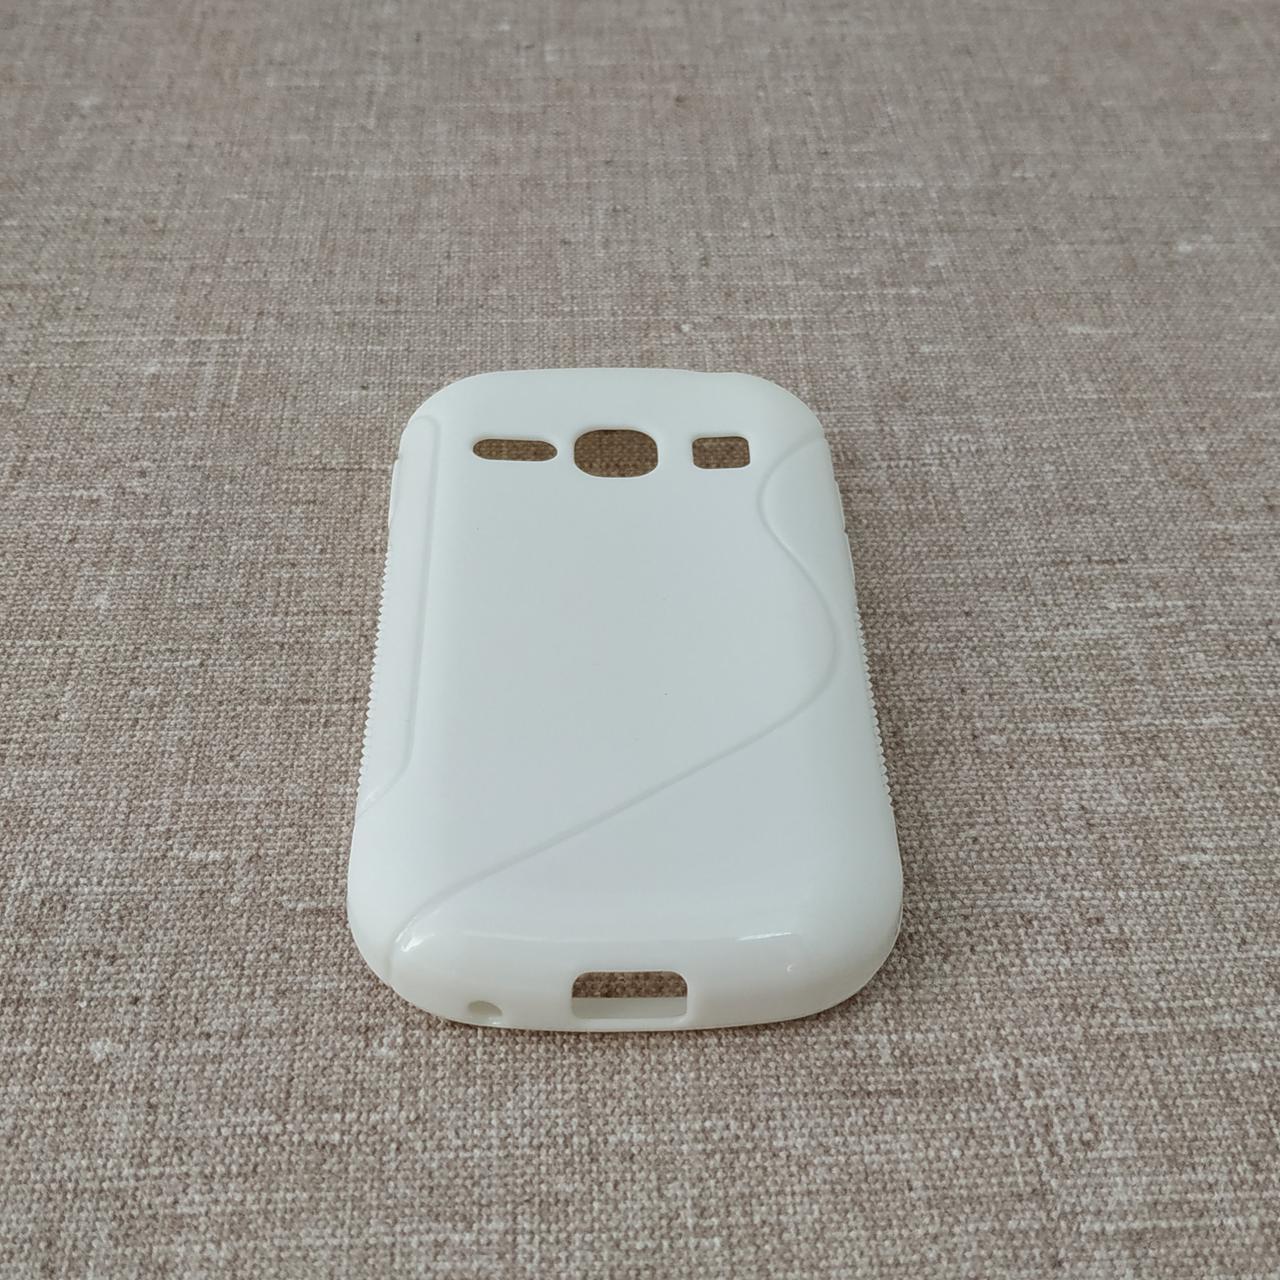 TPU Duotone Samsung Galaxy Fame white